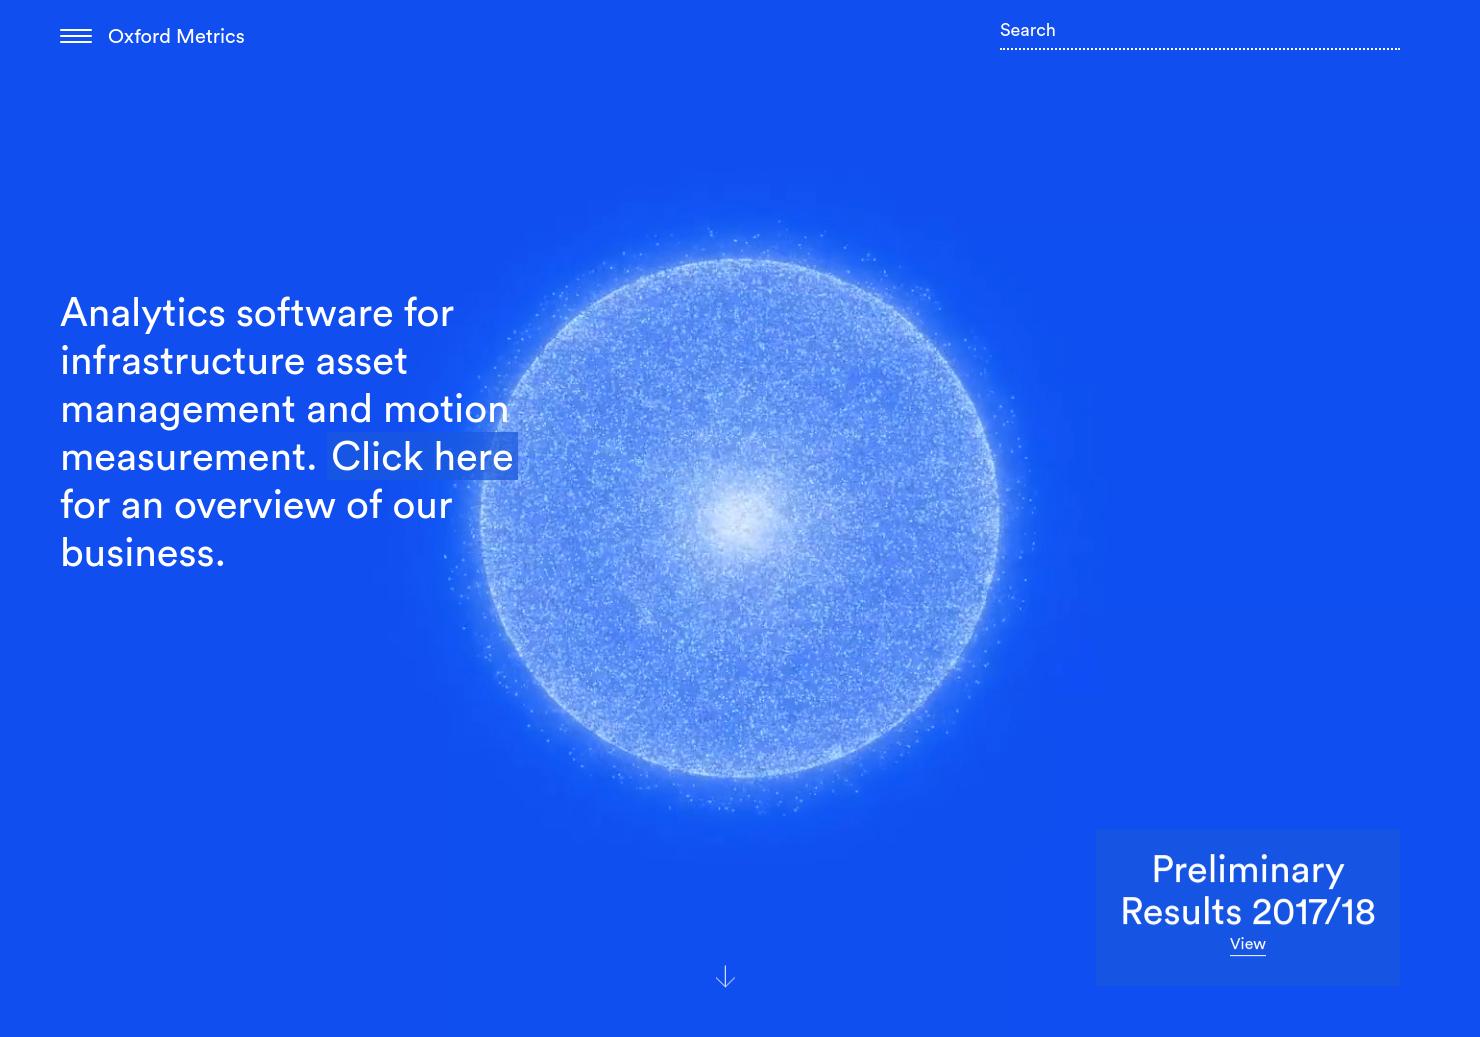 Oxford Metrics Home Page